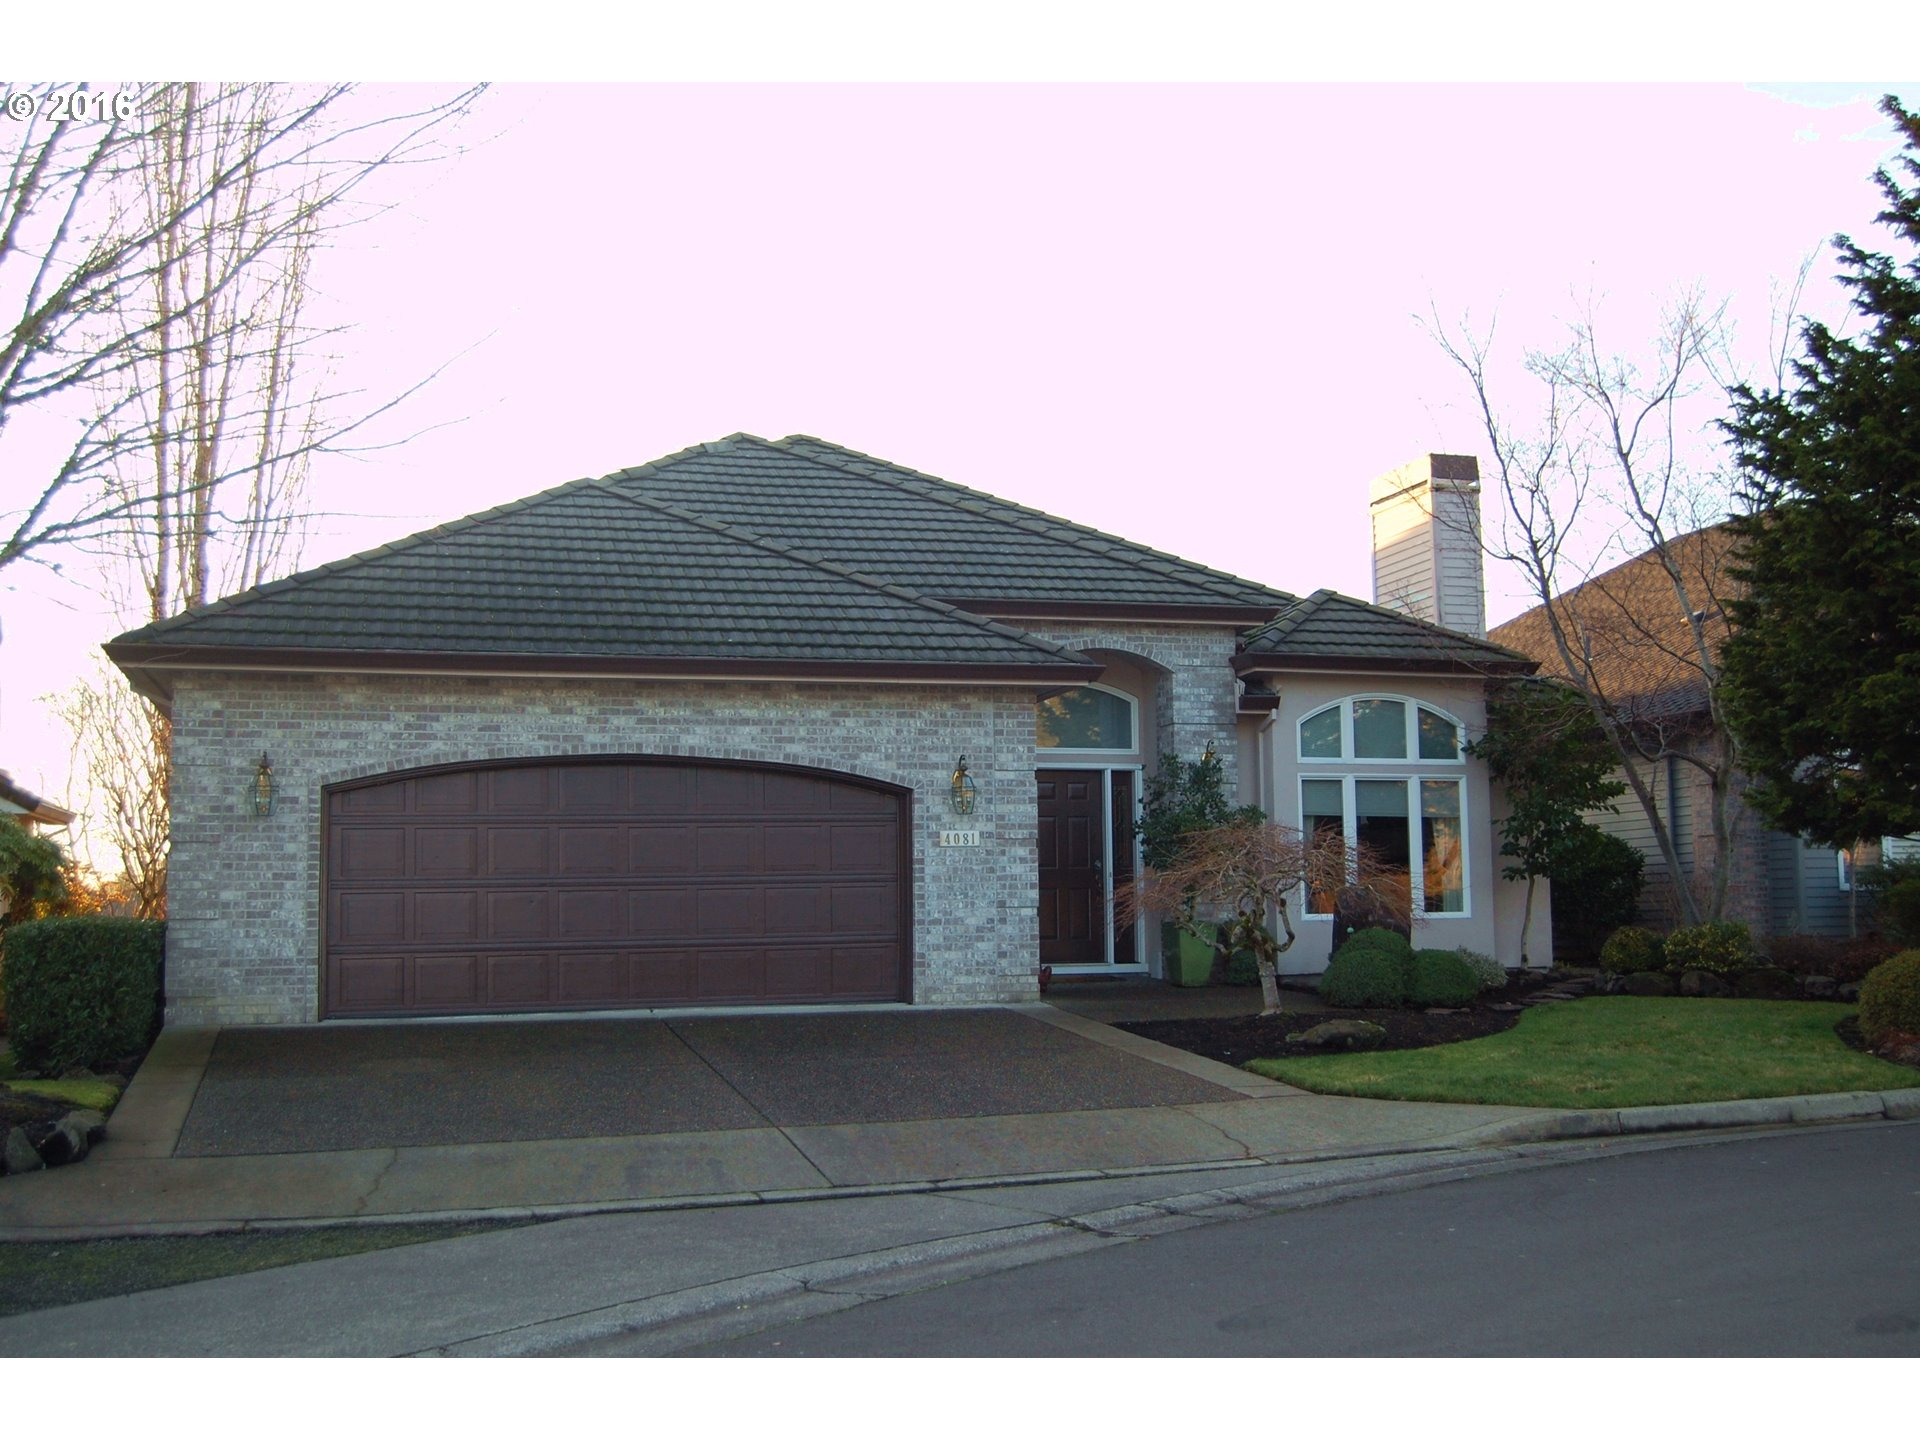 4081 NW Gleneagles Pl, Portland, OR